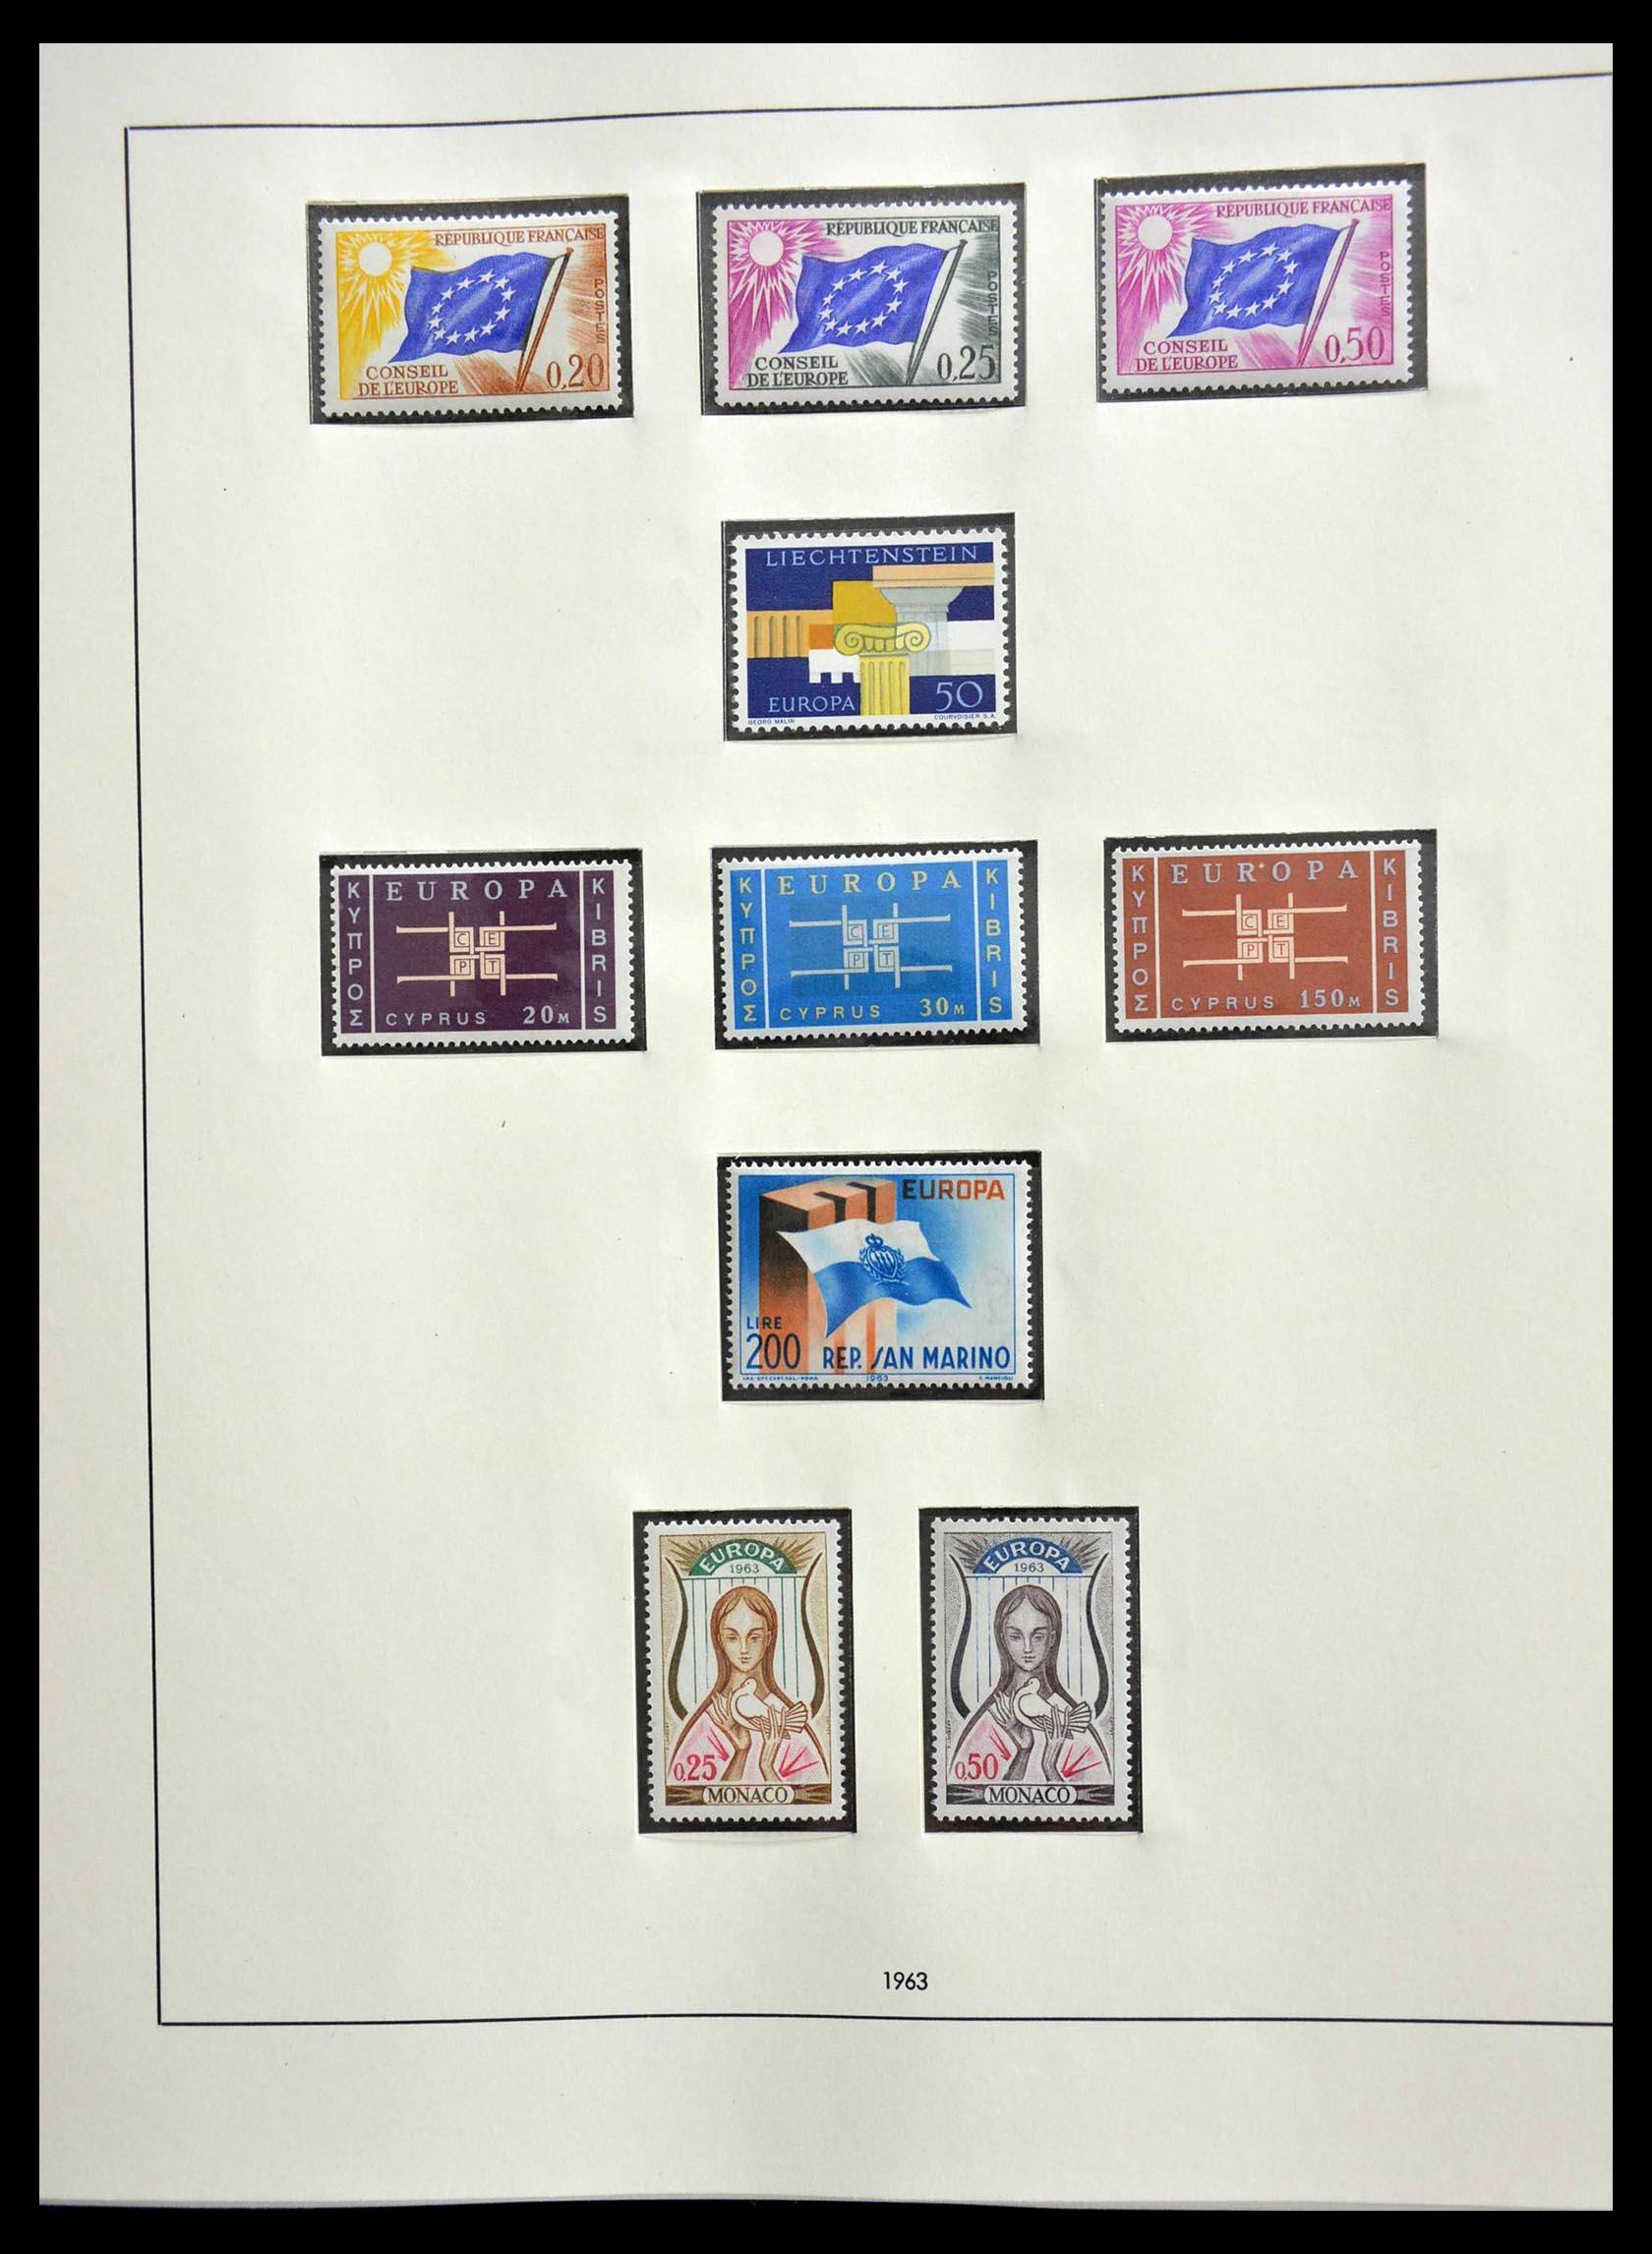 28637 014 - 28637 Europe Cept 1956-2000.